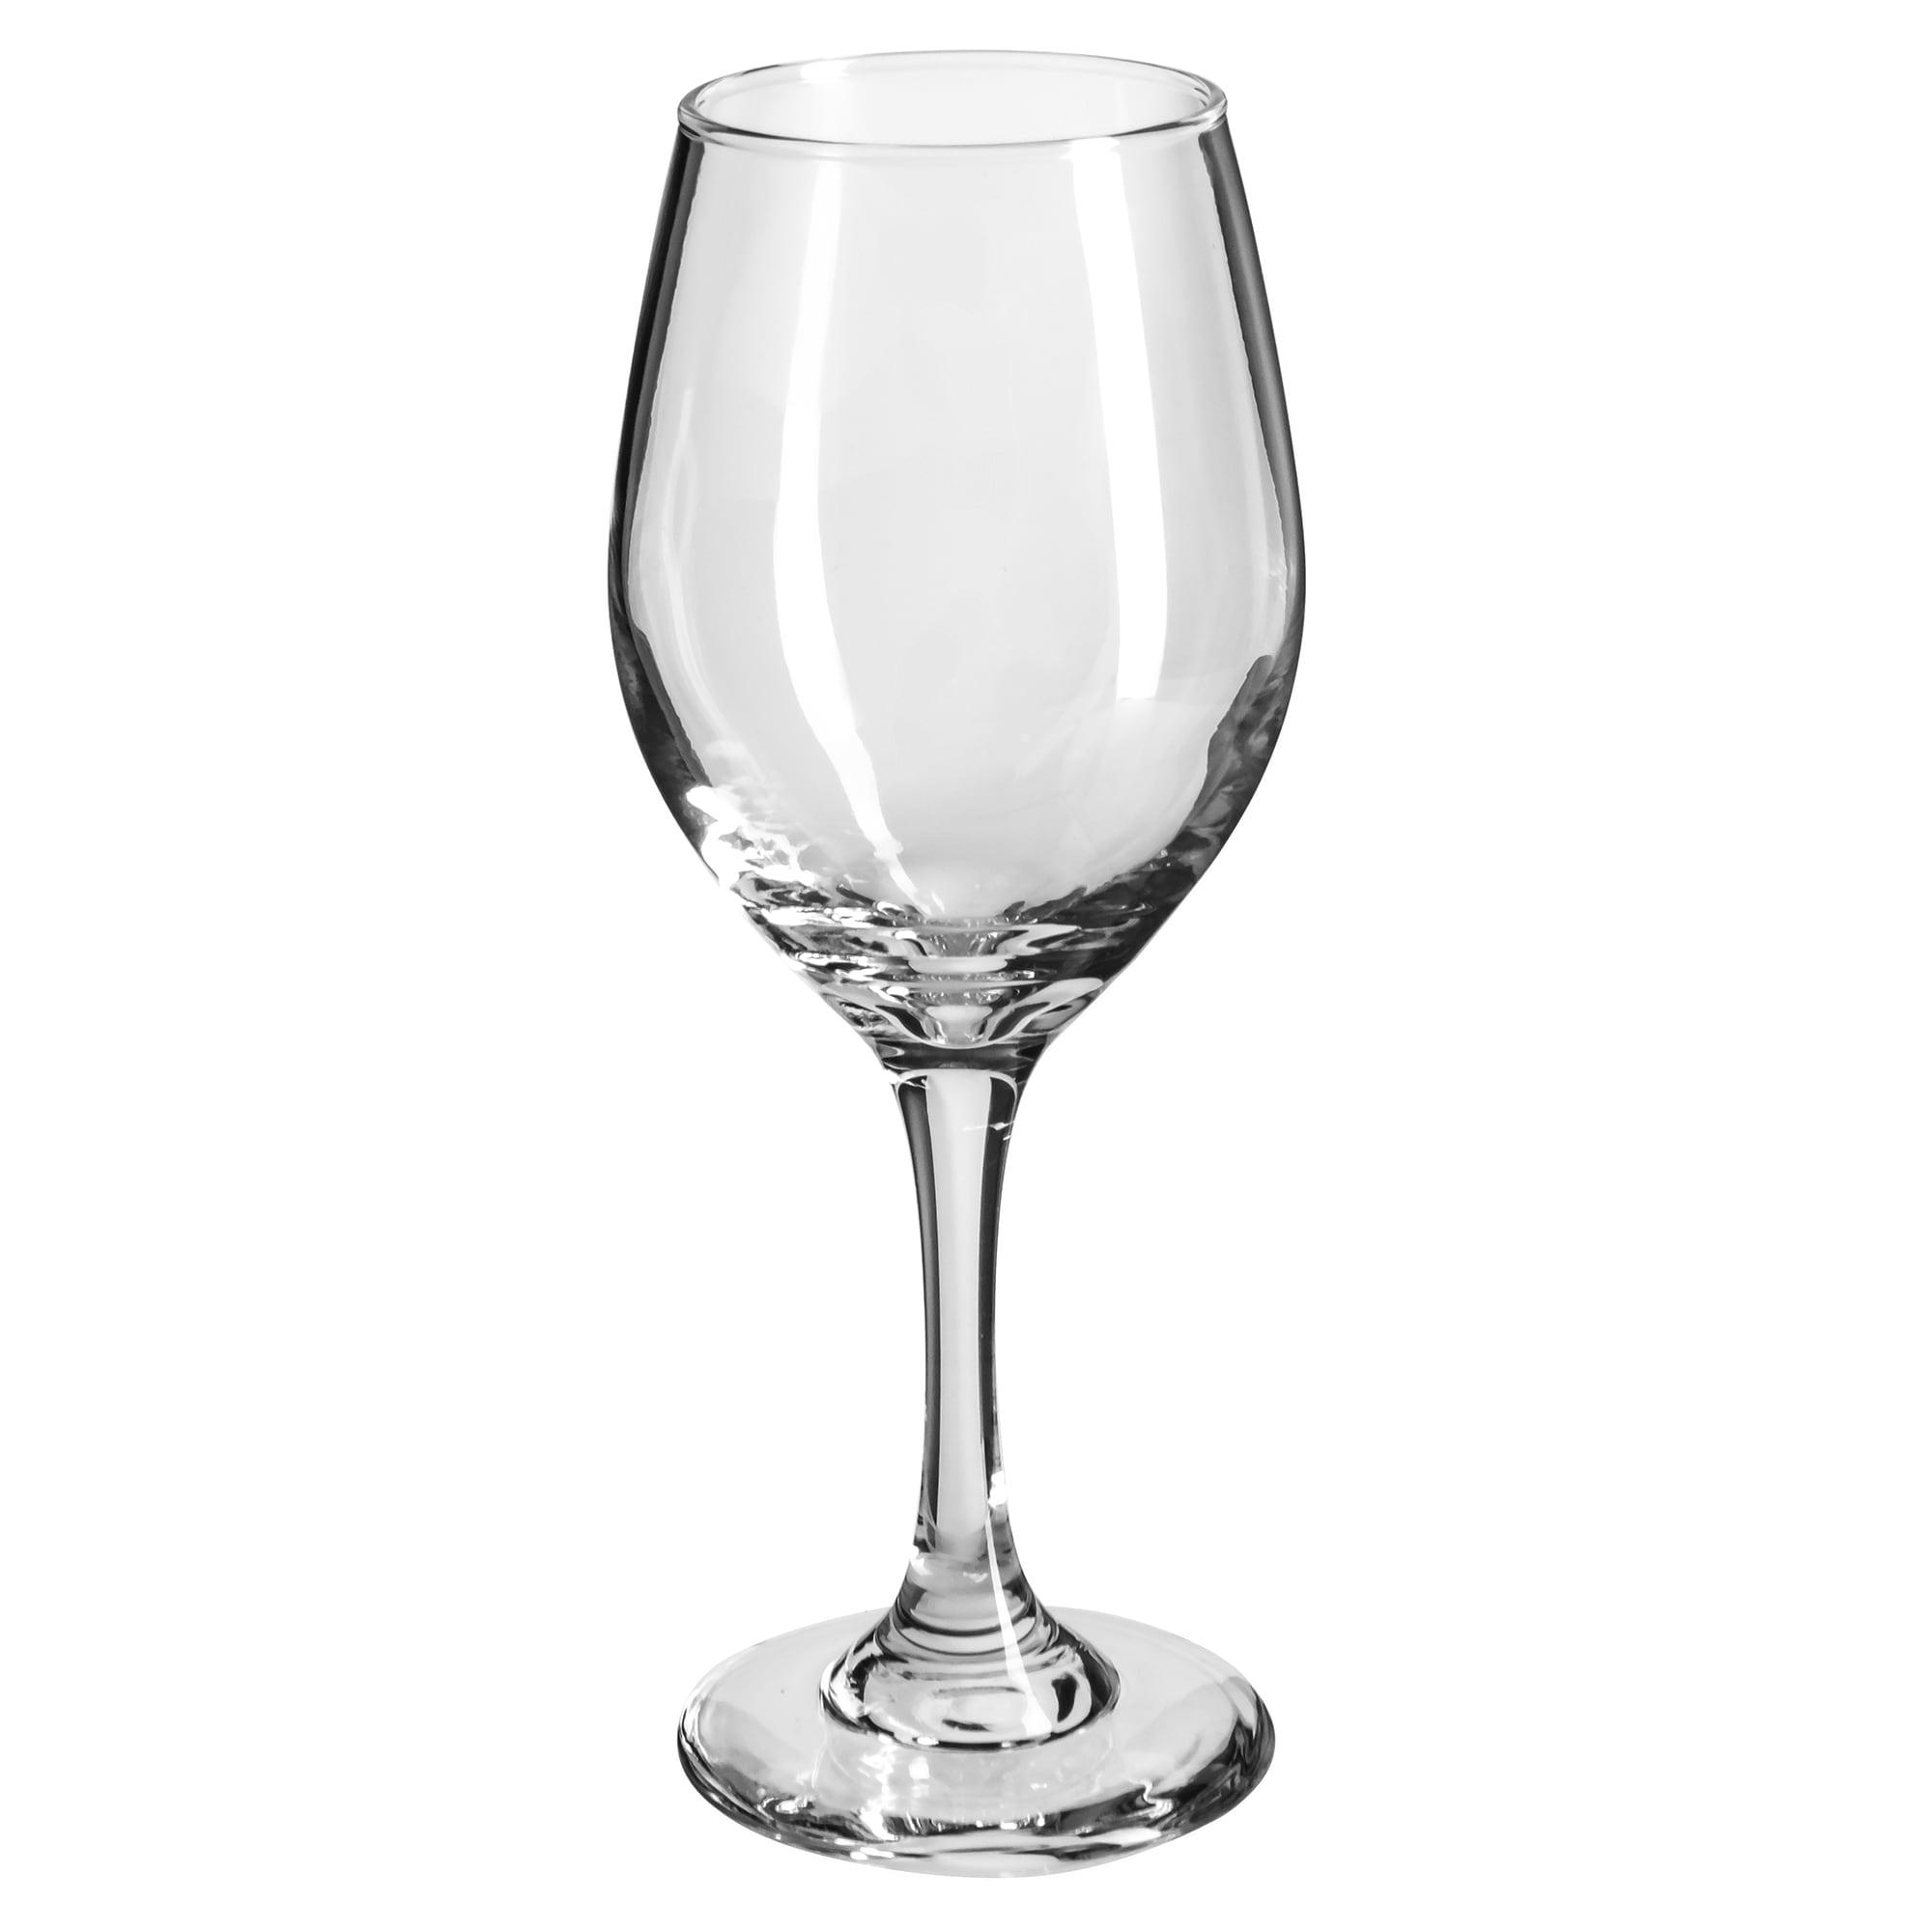 Libbey 3057 11 oz Perception Wine Glass - Safedge Rim & Foot